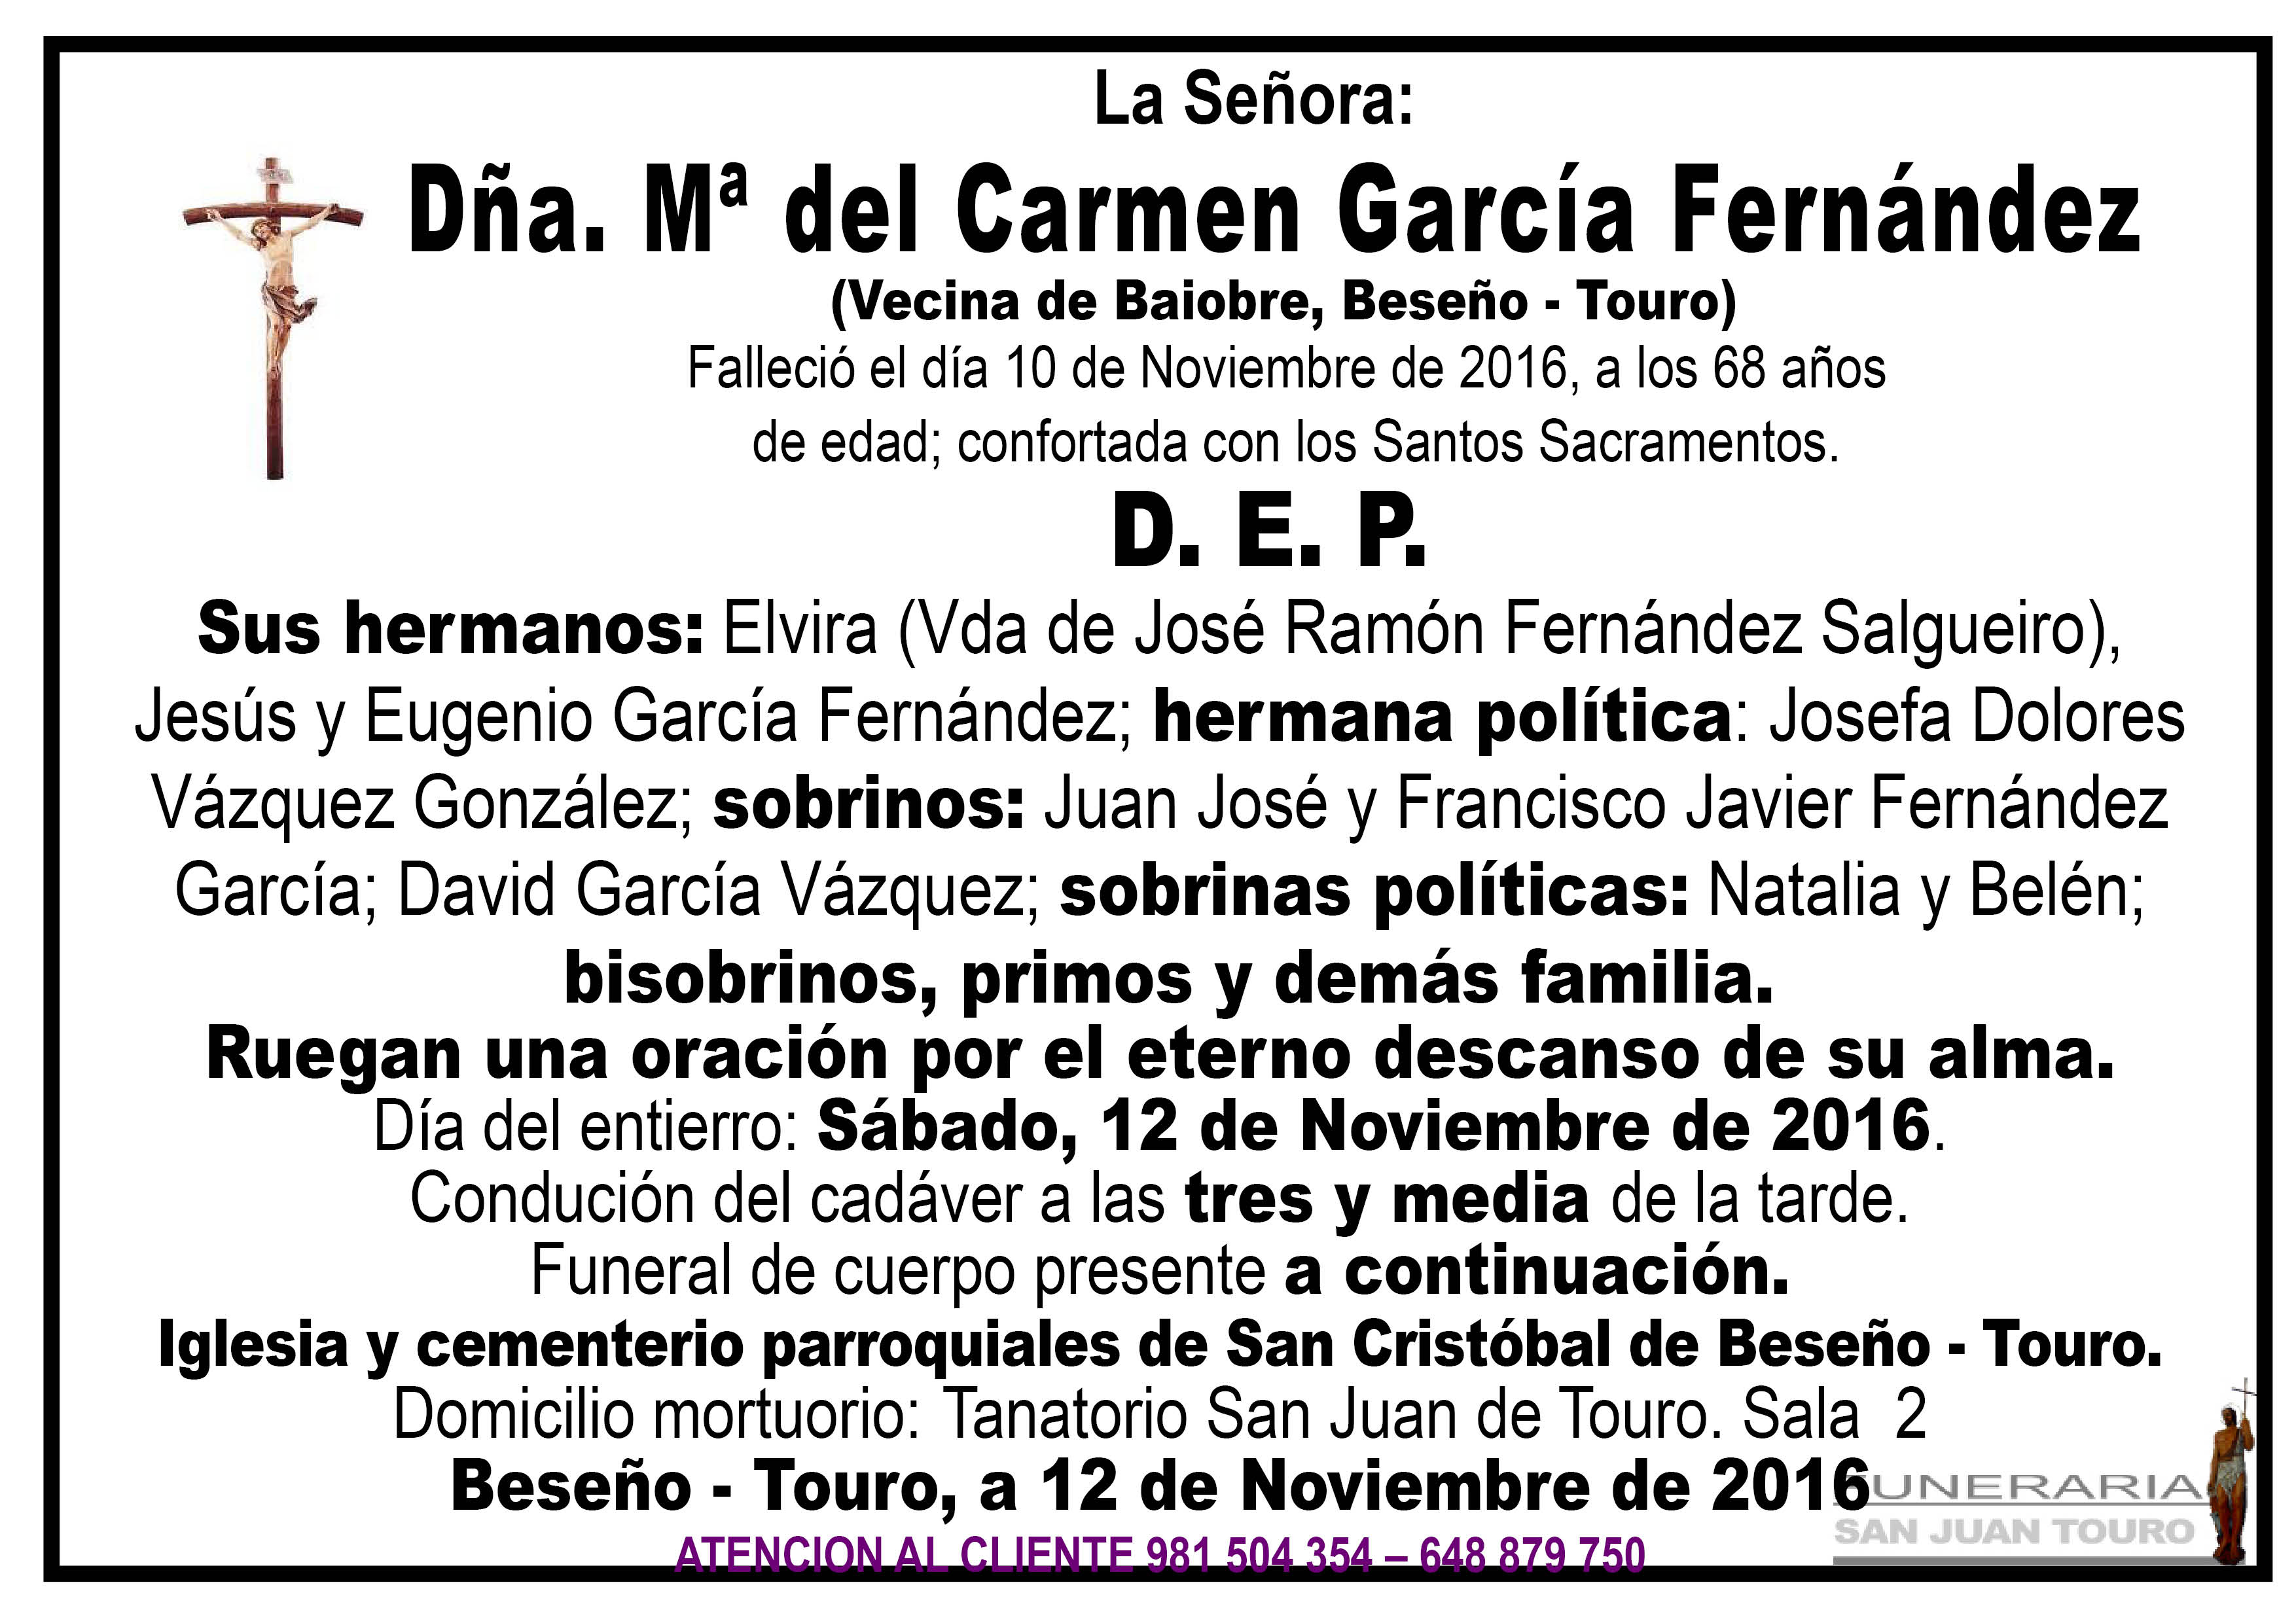 Esquela de SEPELIO DÑA Mª DEL CARMEN GARCÍA FERNÁNDEZ